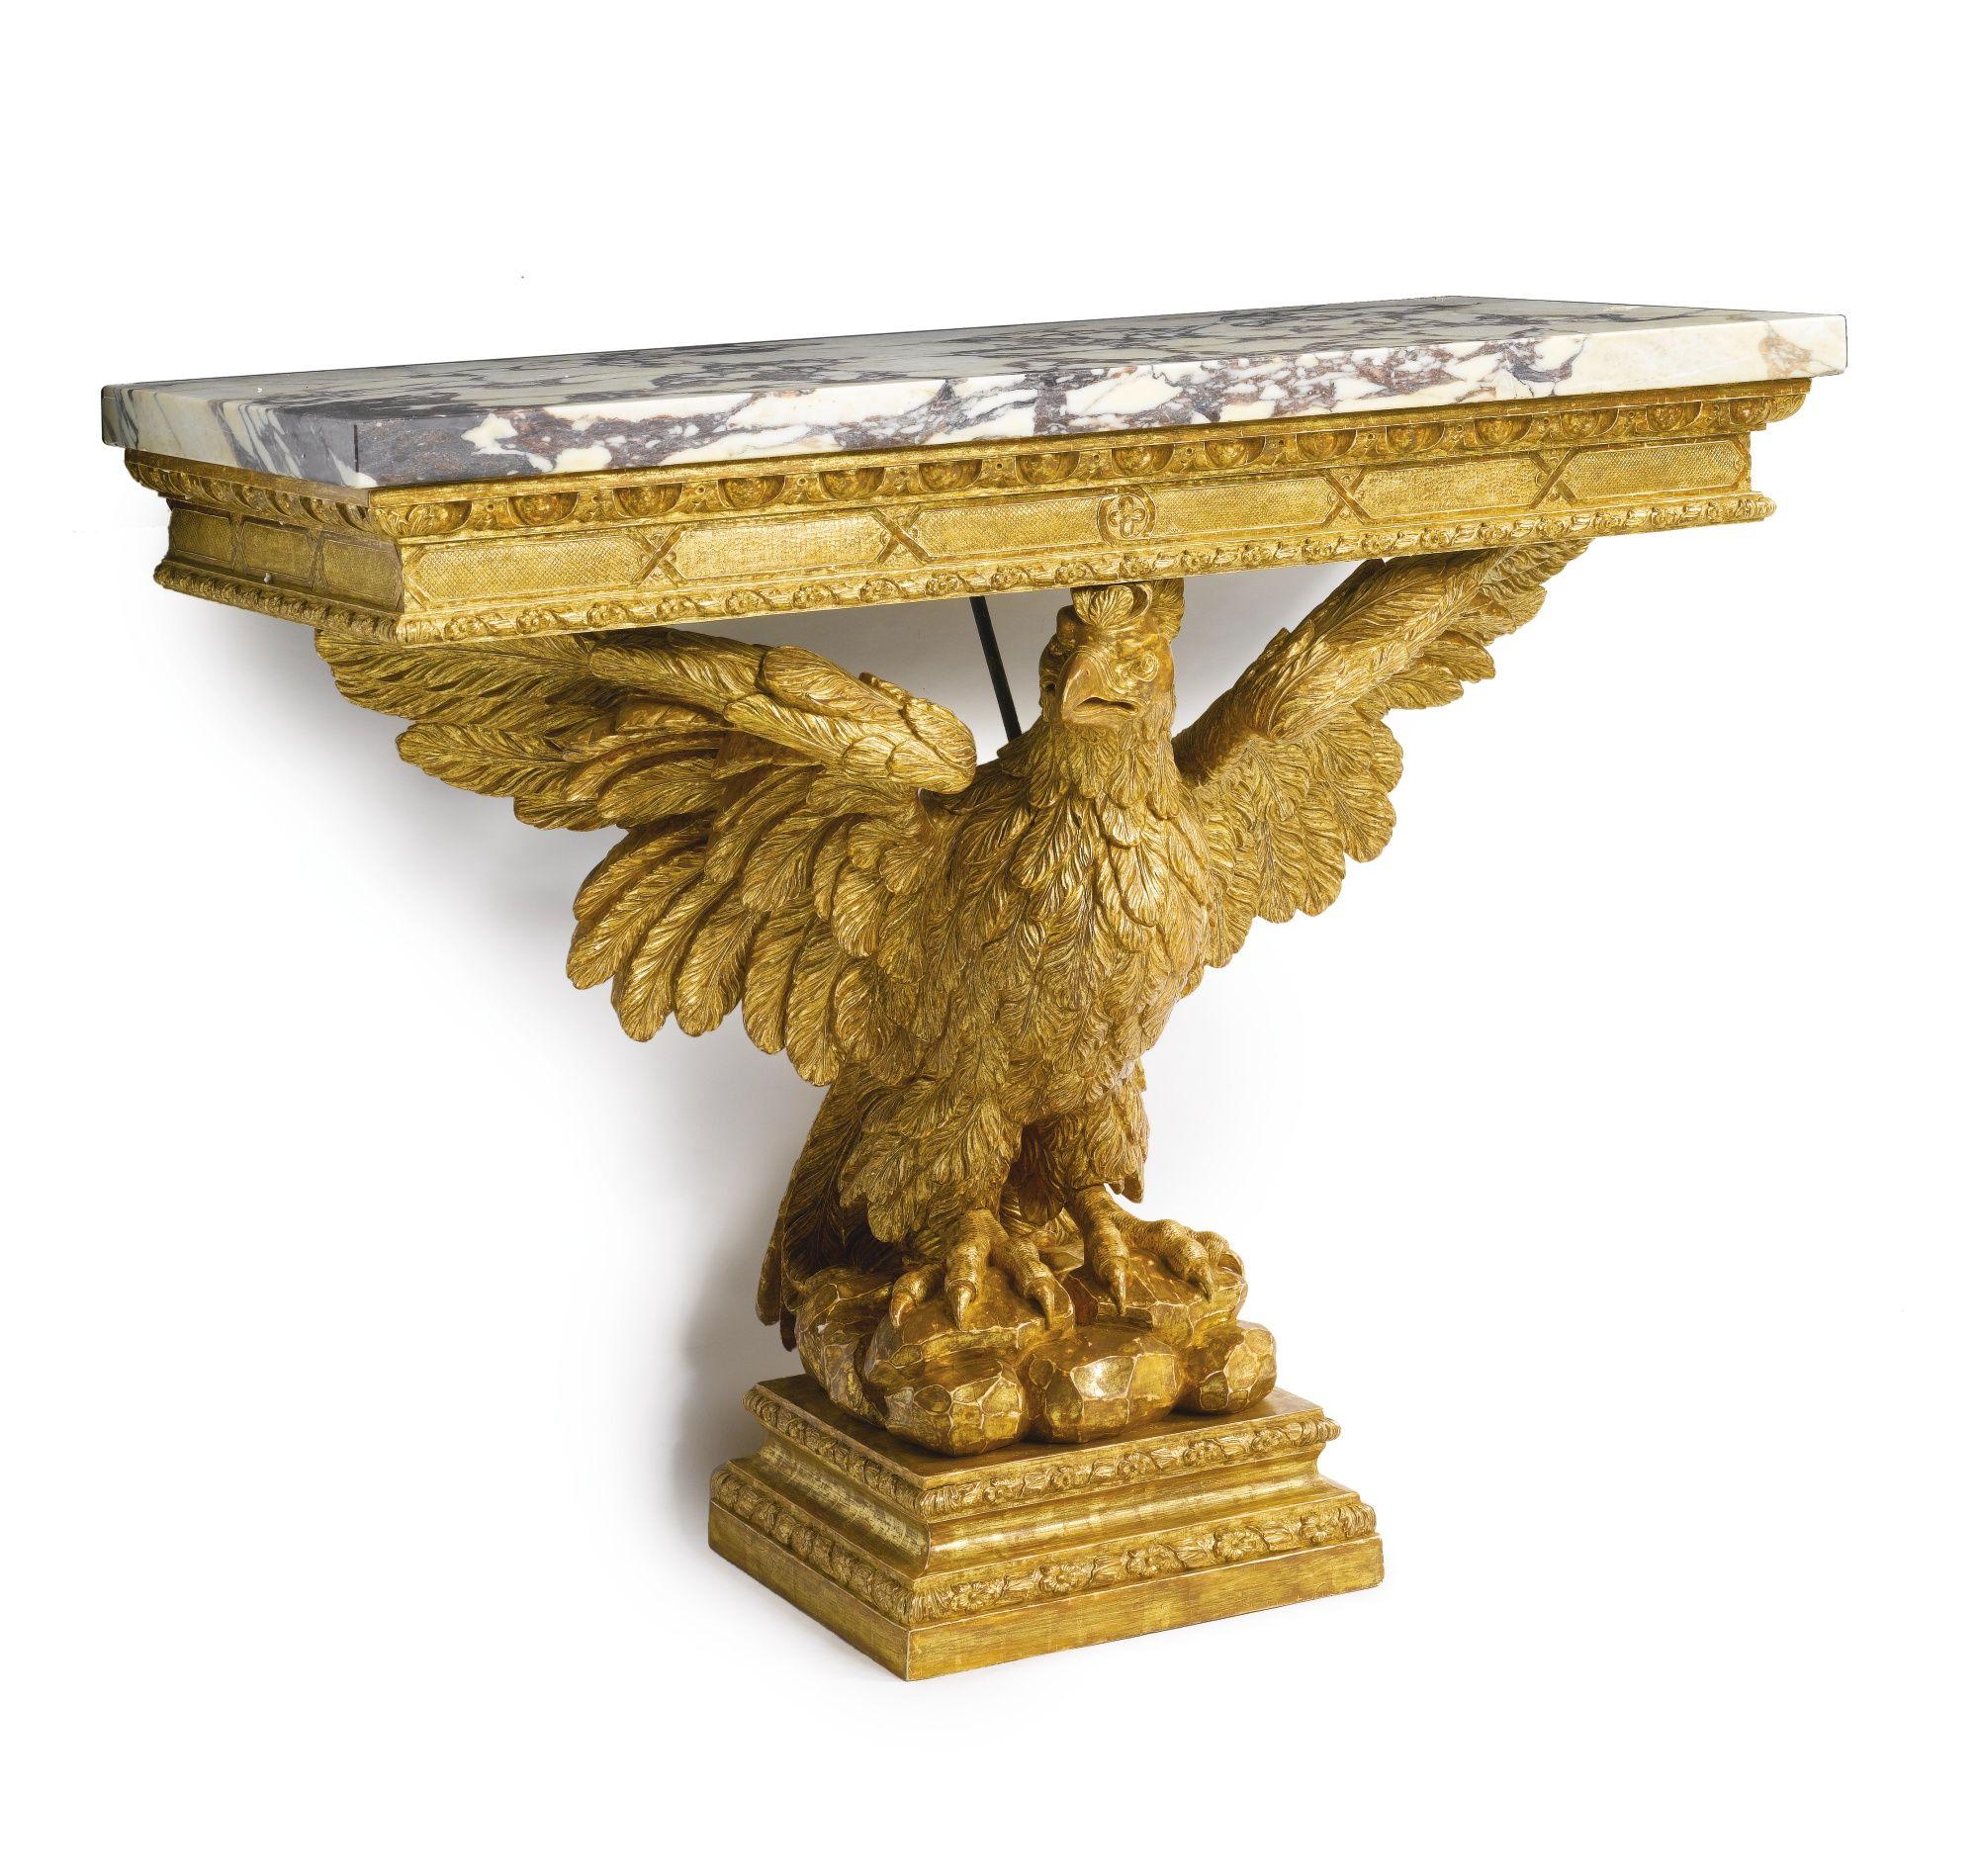 C1740 A George Ii Giltwood Marble Top Eagle Form Console Table Circa 1740 Estimate 20 000 30 000 Usd Lot English Furniture Console Table Classic Furniture